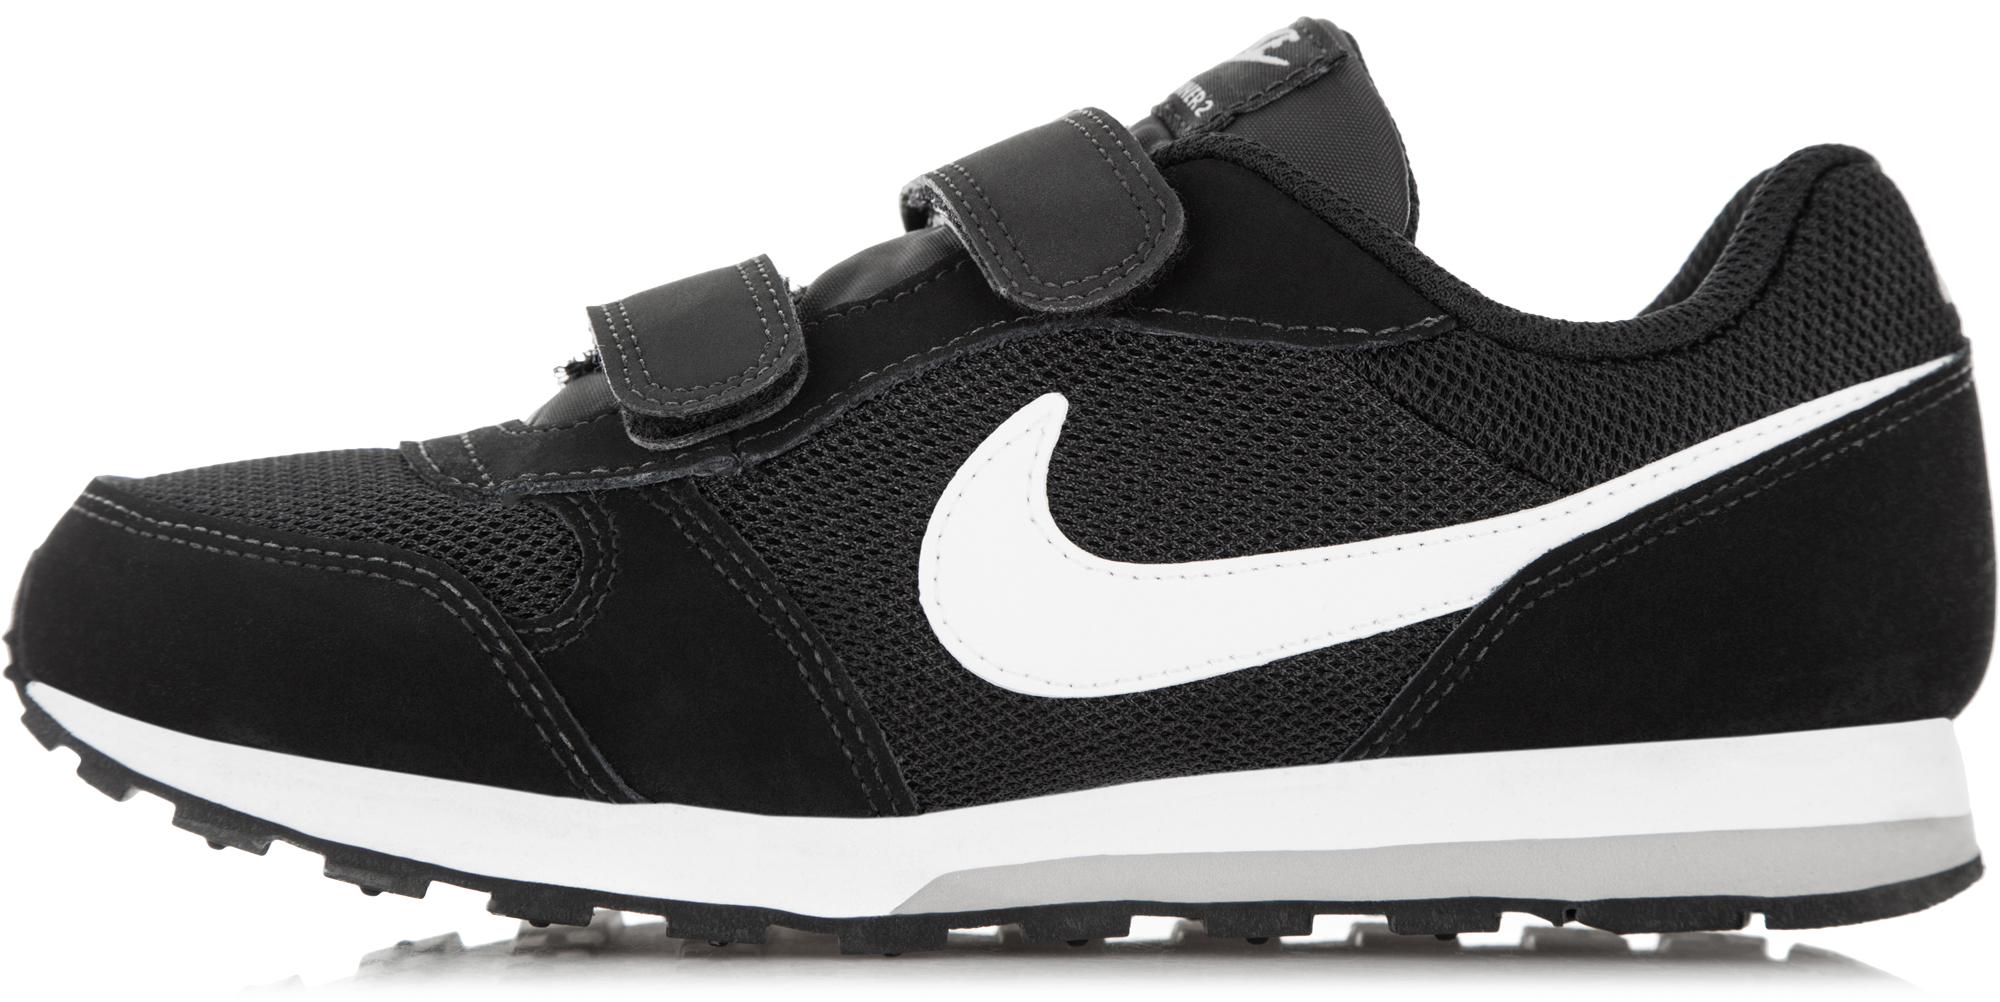 Nike Кроссовки для мальчиков Nike MD Runner 2, размер 30,5 nike кроссовки для мальчиков nike city court 7 размер 31